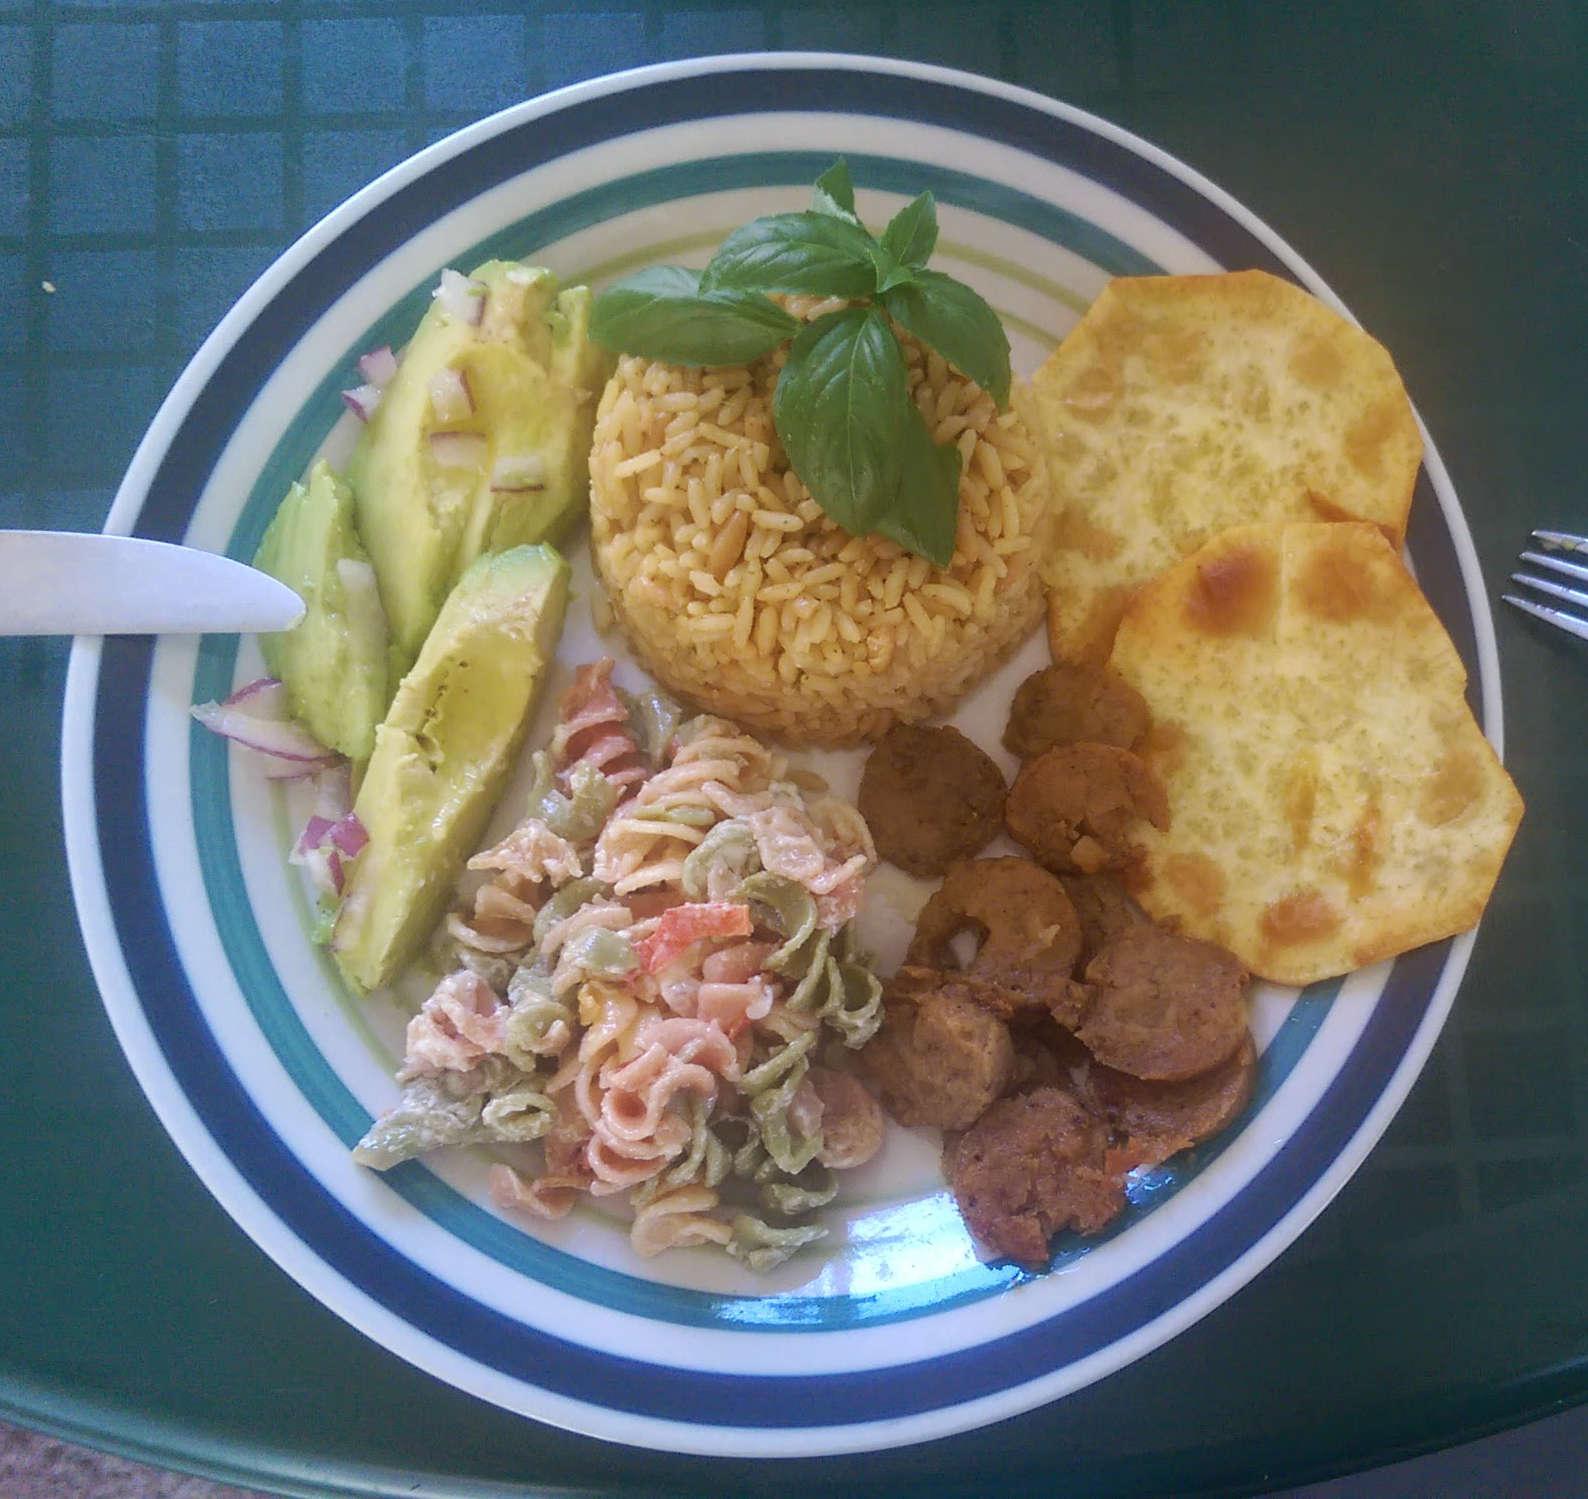 arroz-con-salchichas-de-vegetales